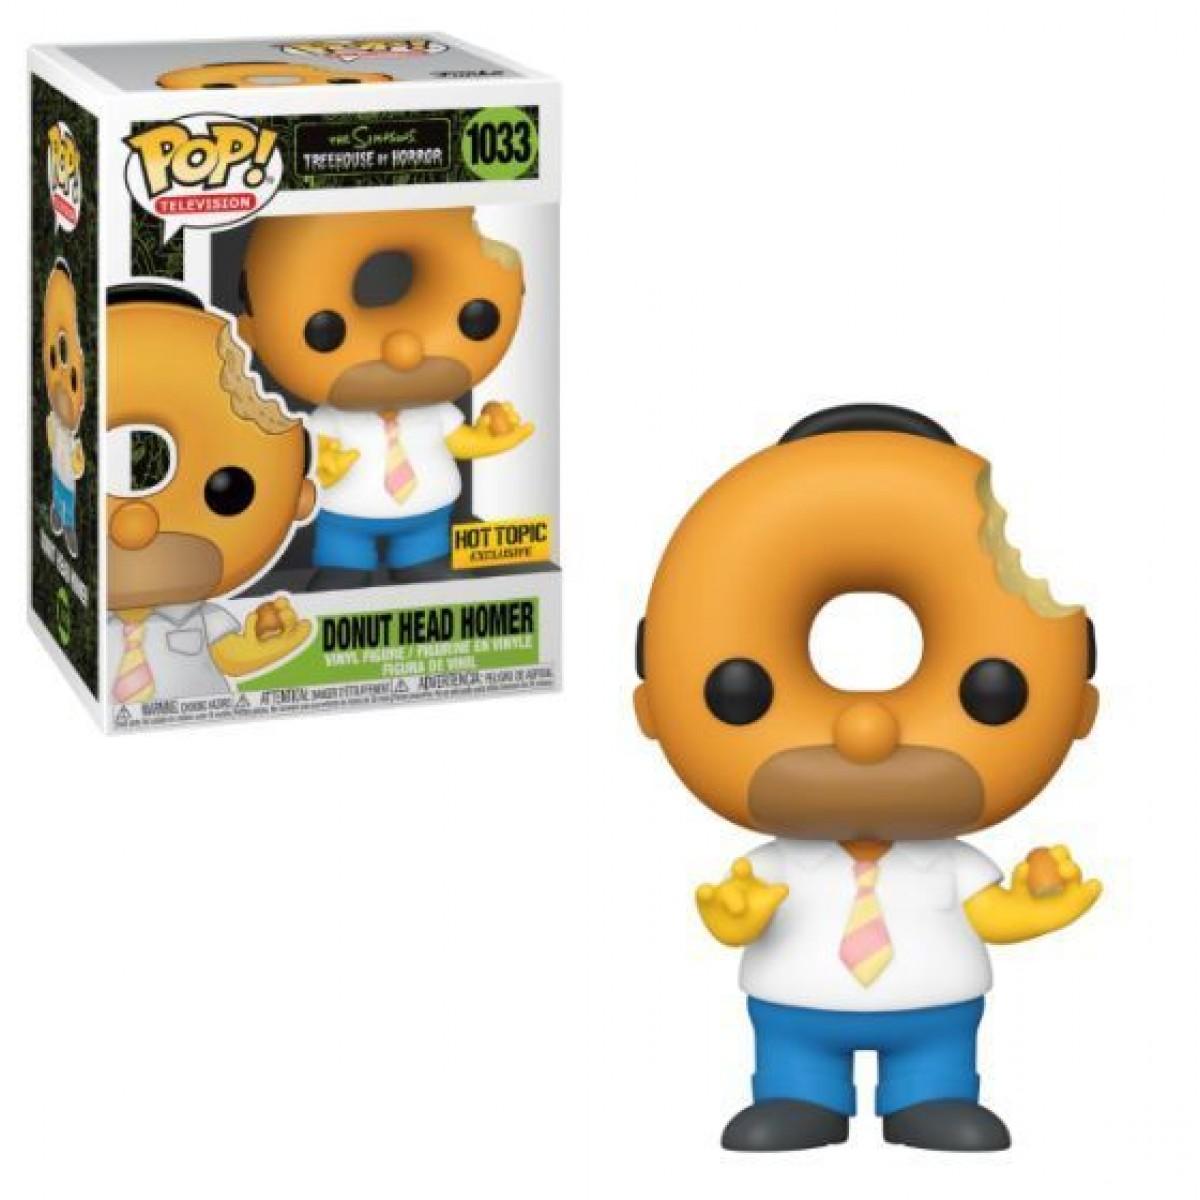 Funko POP! The Simpsons, Donut Head Homer N 39826